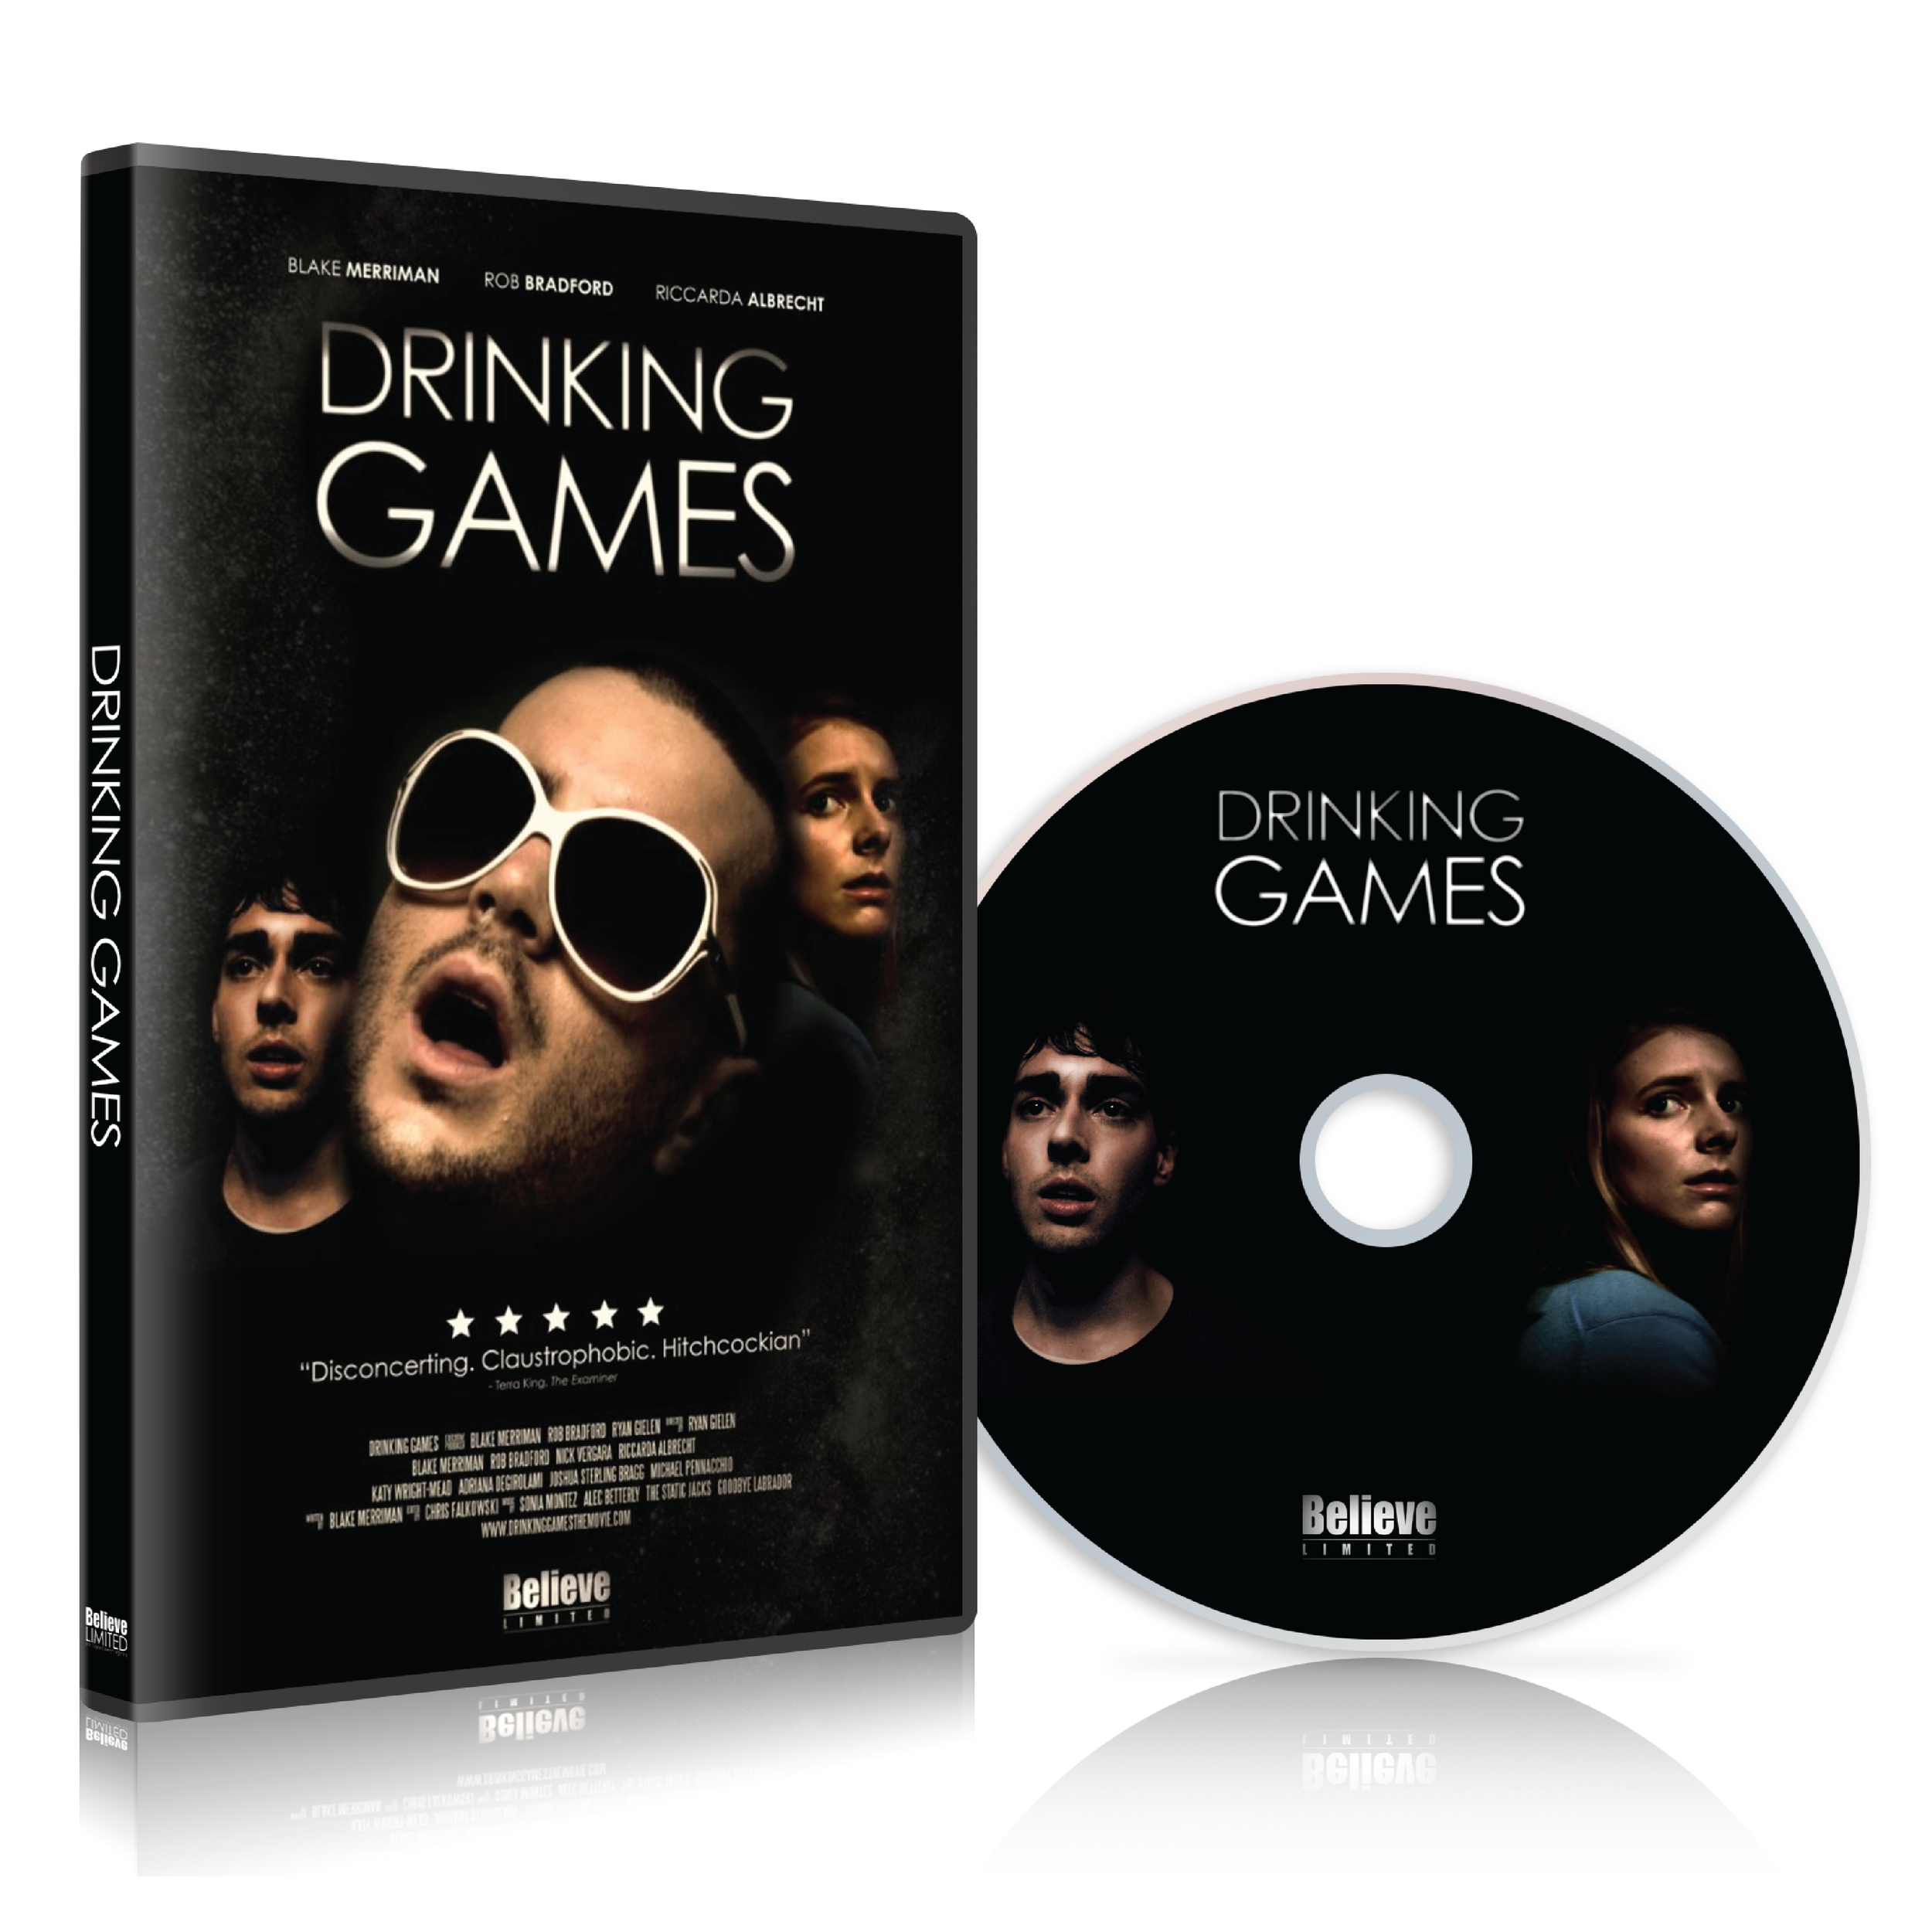 DVD 3 - dg dvd2-03 (1).png